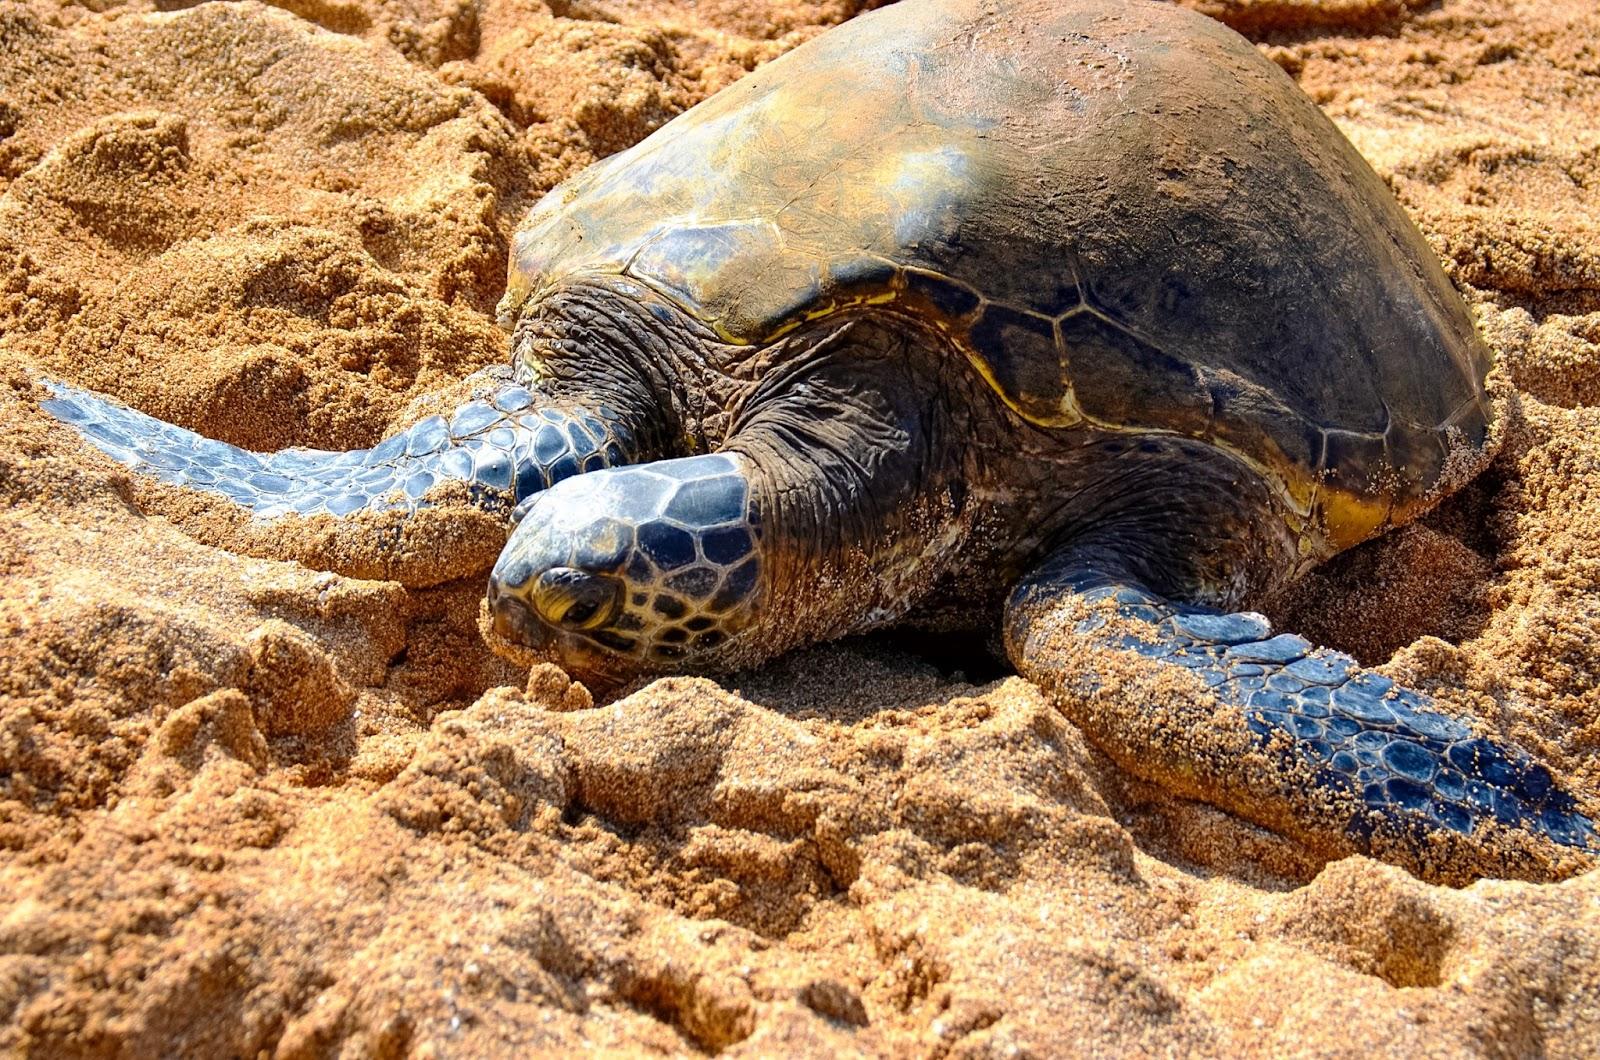 turtles at turtle bay